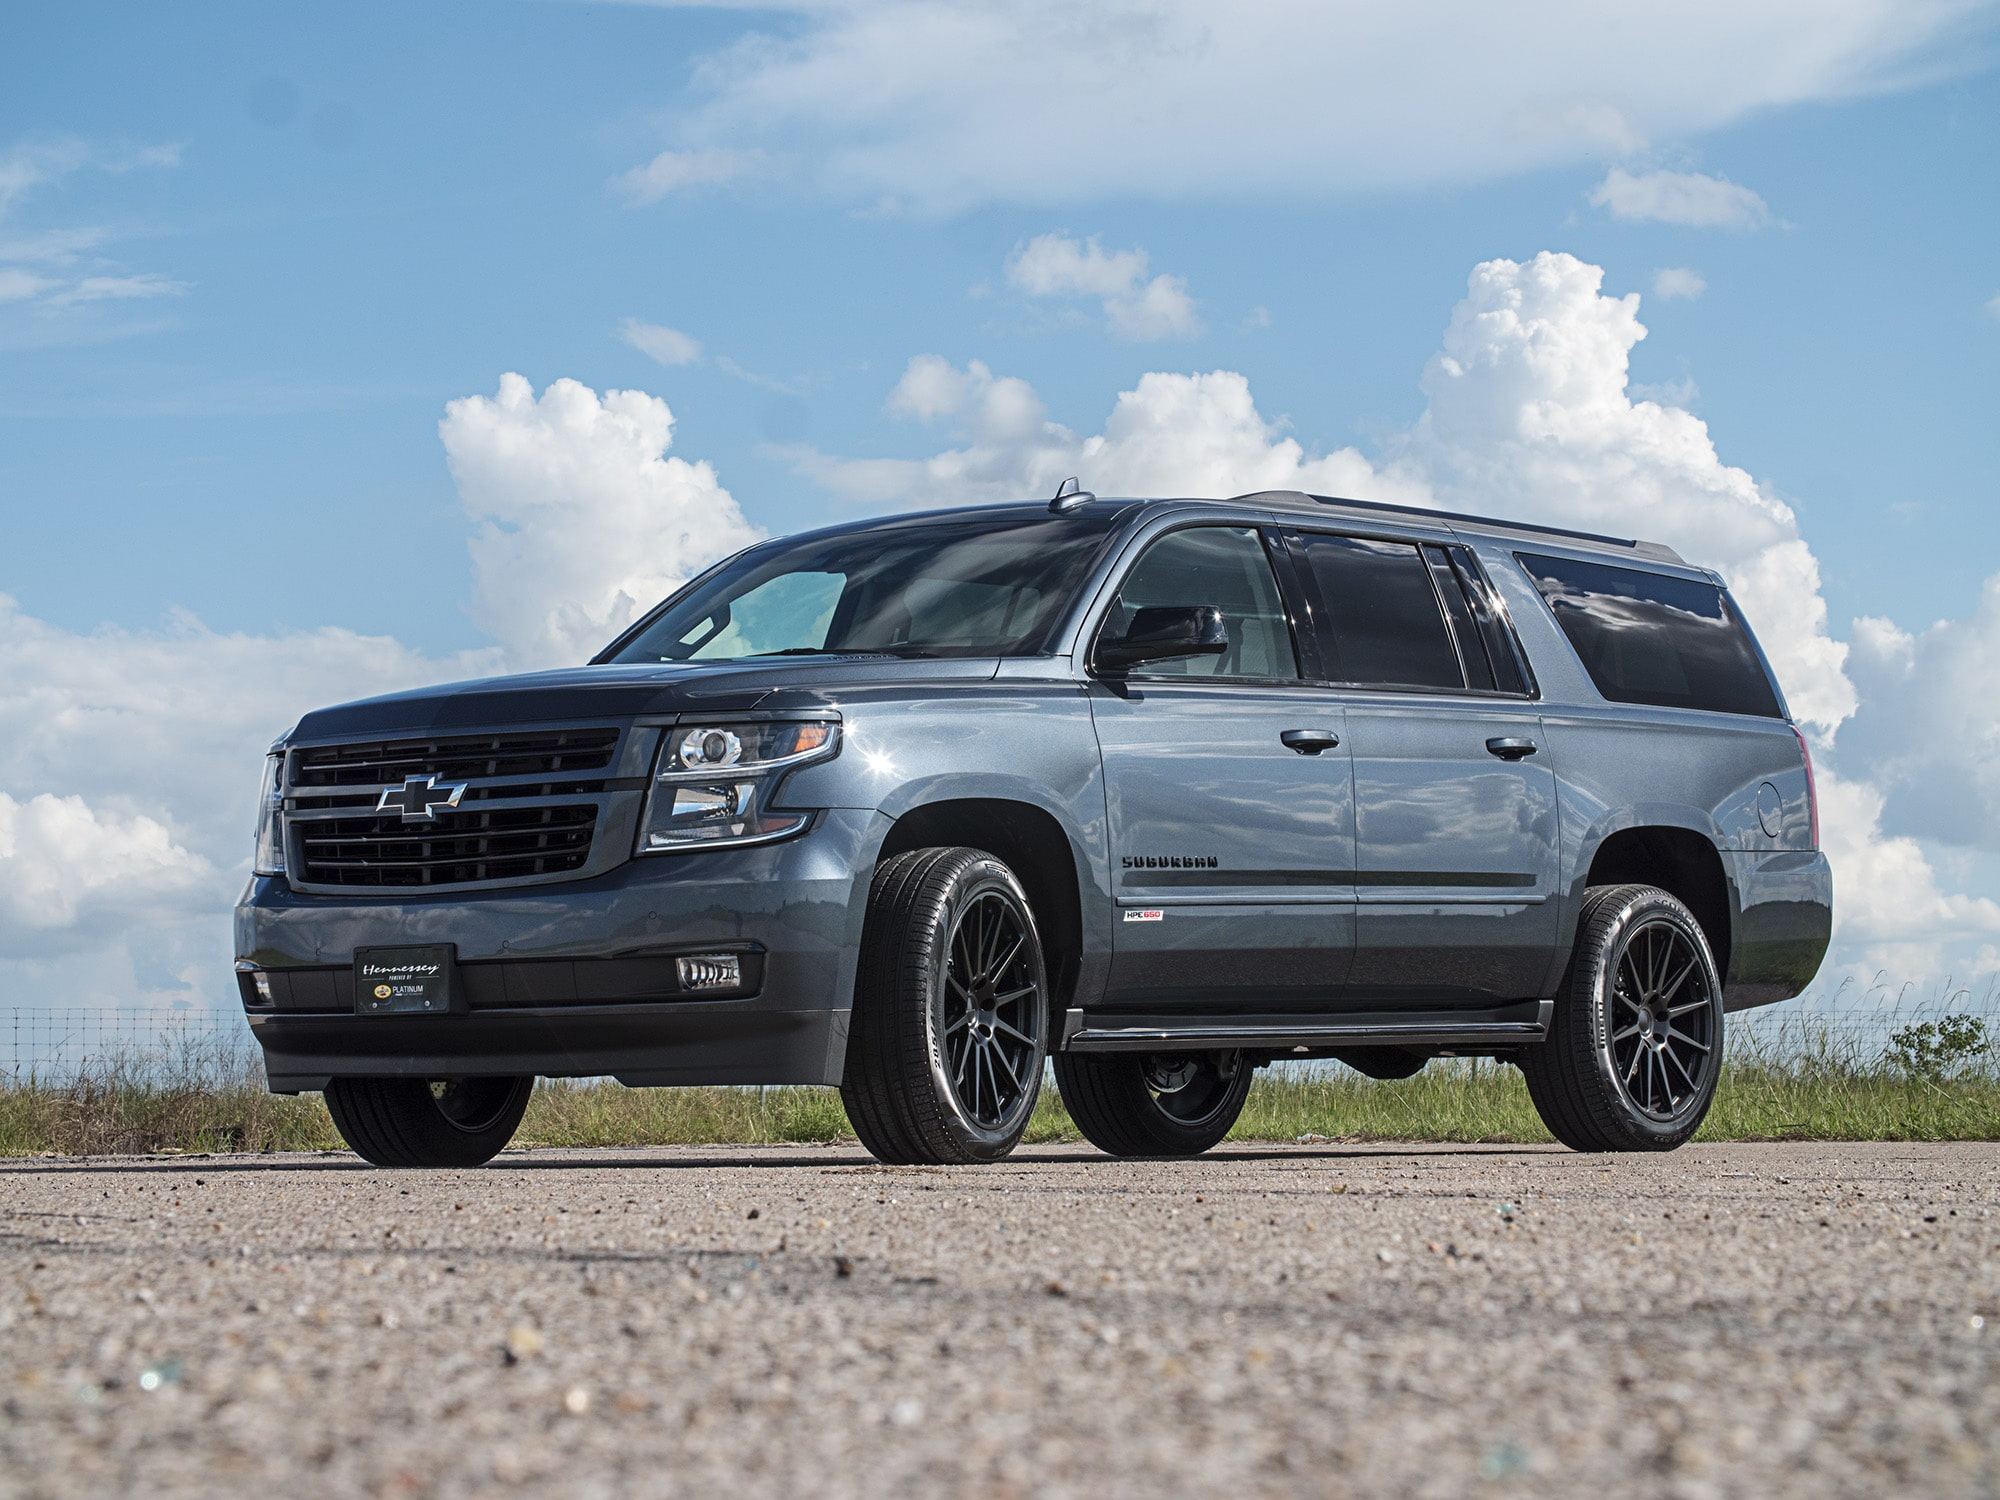 Hennessey HPE650 Chevrolet Suburban RST  2018 HPE650-2018-Chevy-Suburban-Dark-Blue-1-min